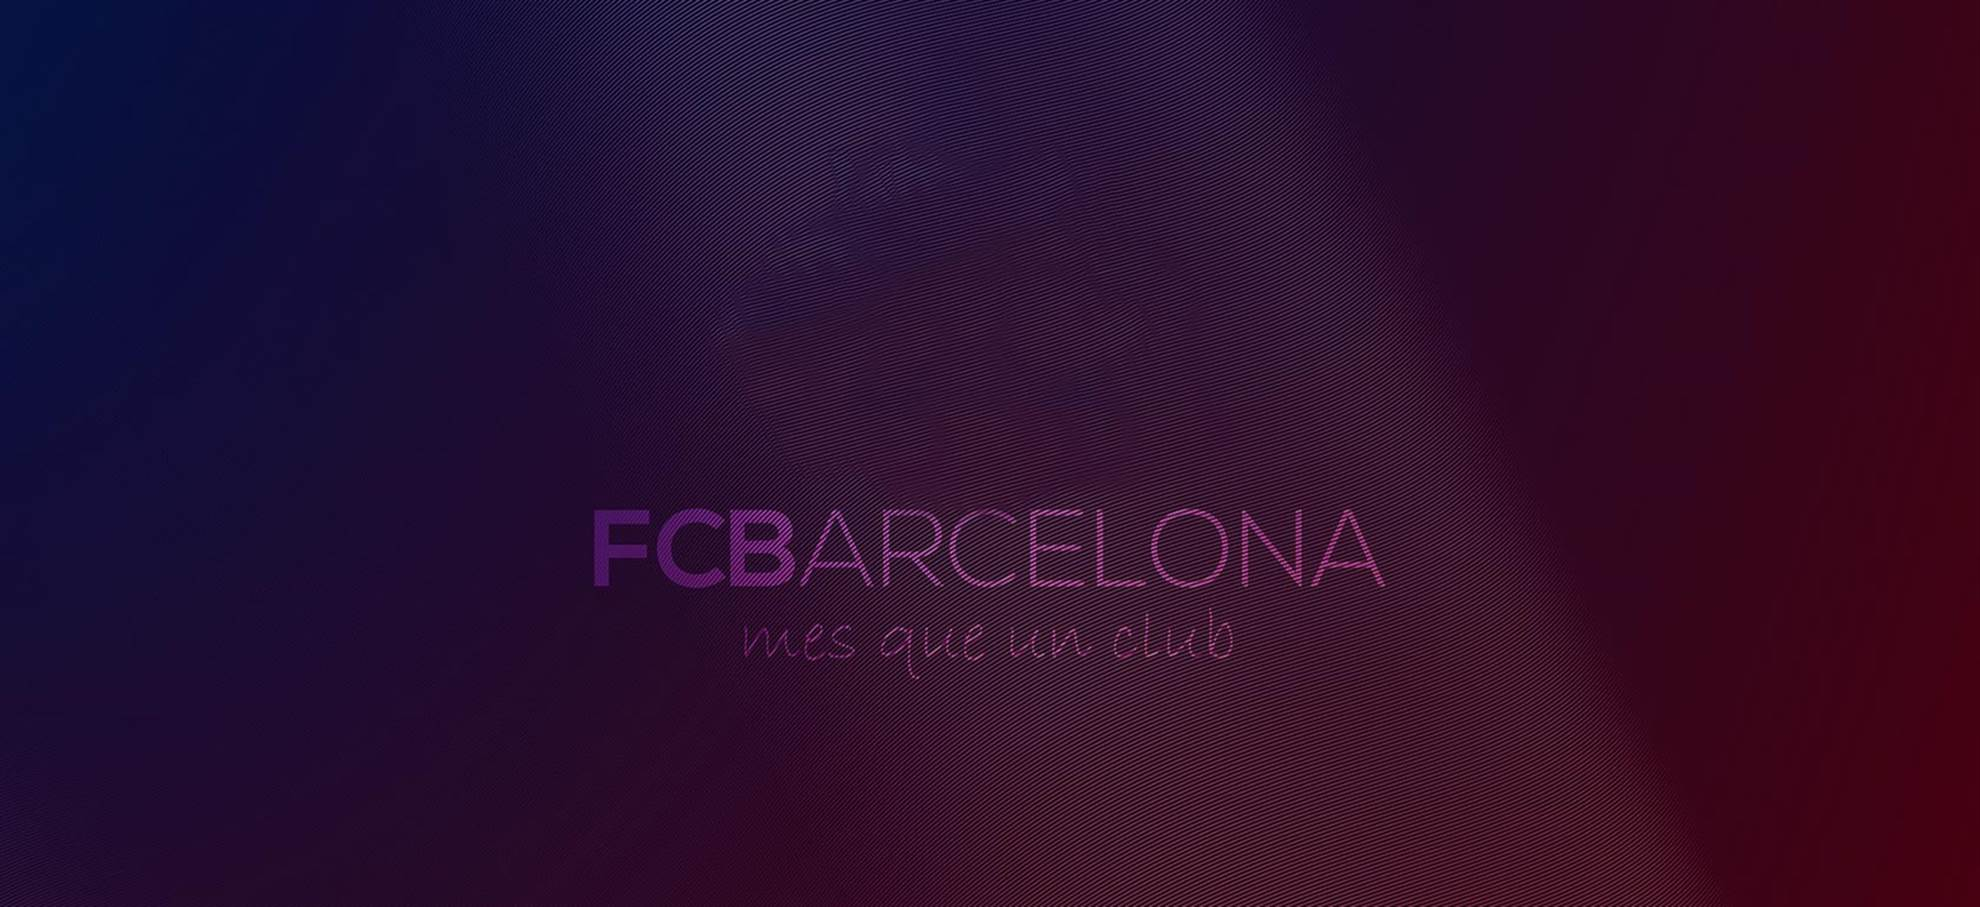 FC Barcelona - Villarreal (24-09-2019)